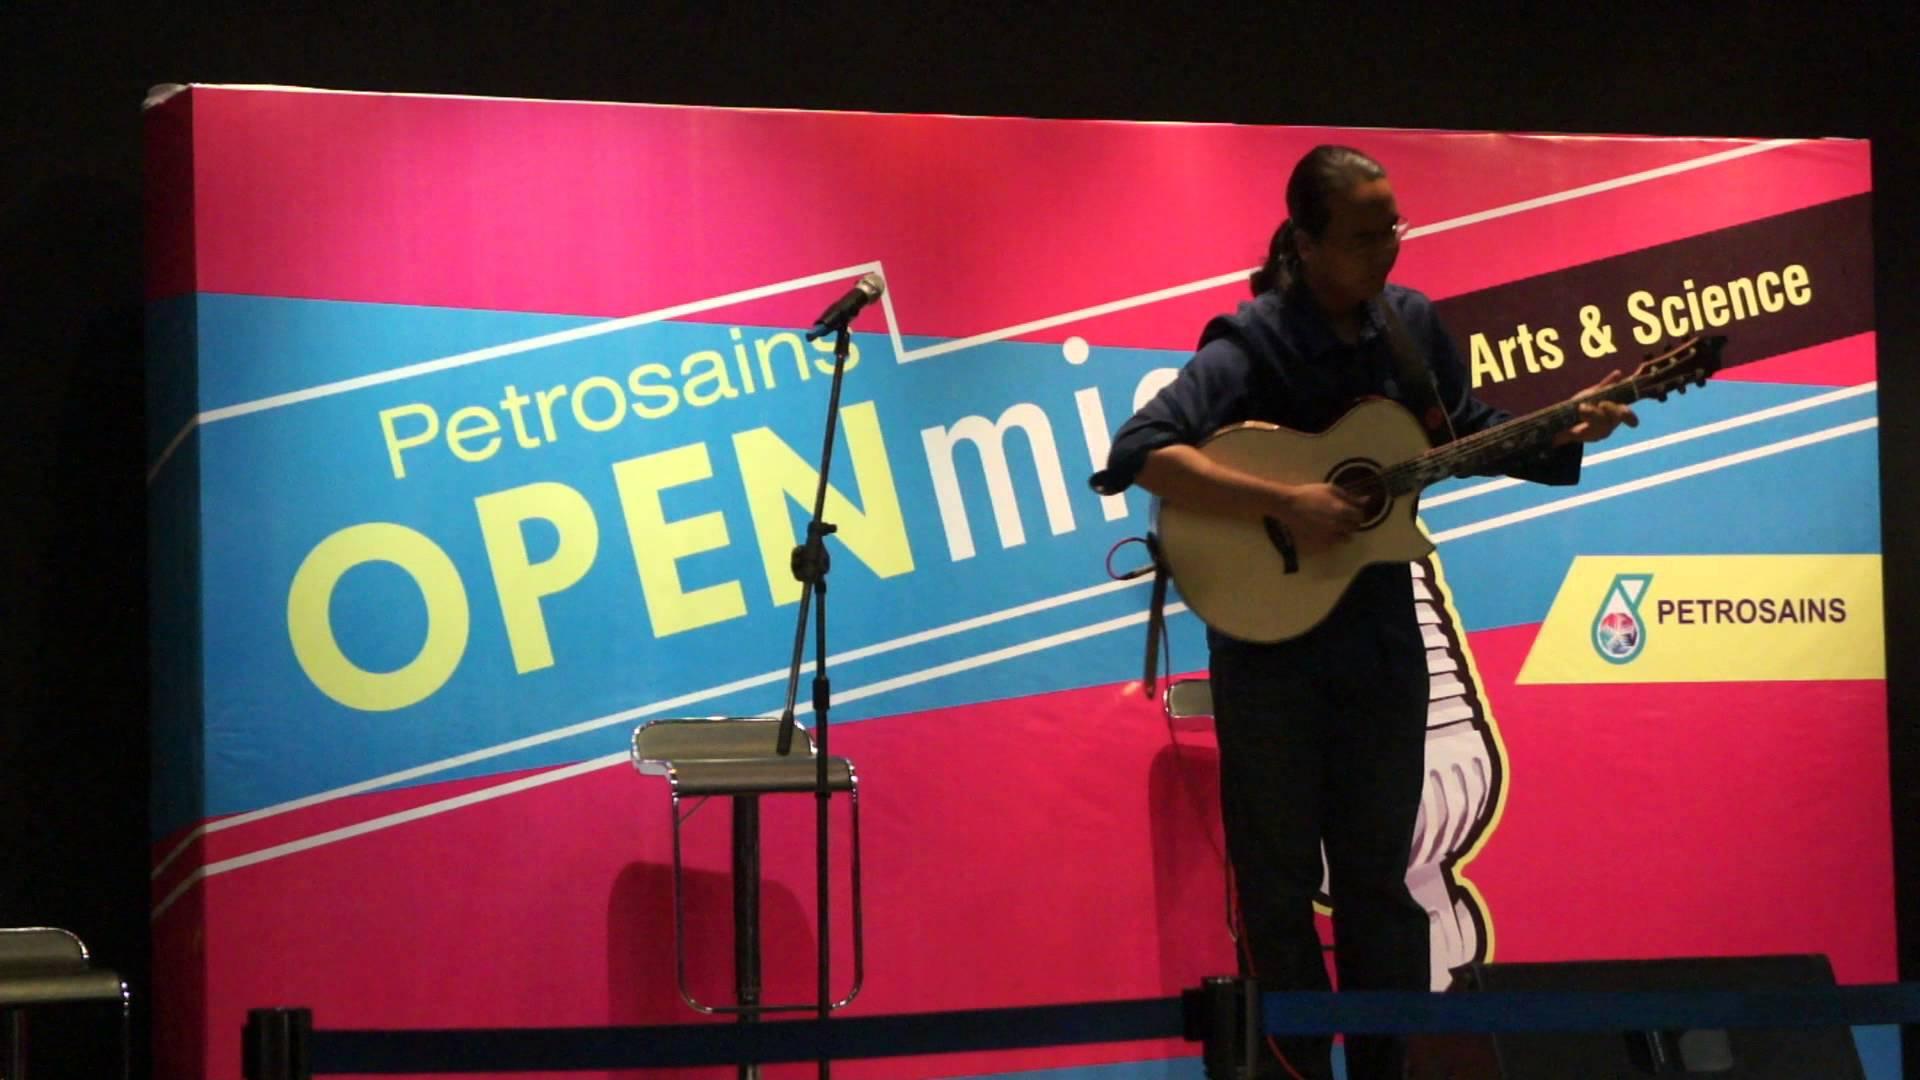 Malam Bulan Dipagar Bintang (P. Ramlee) – Malaysian Fingerstyle Guitar by Az Samad